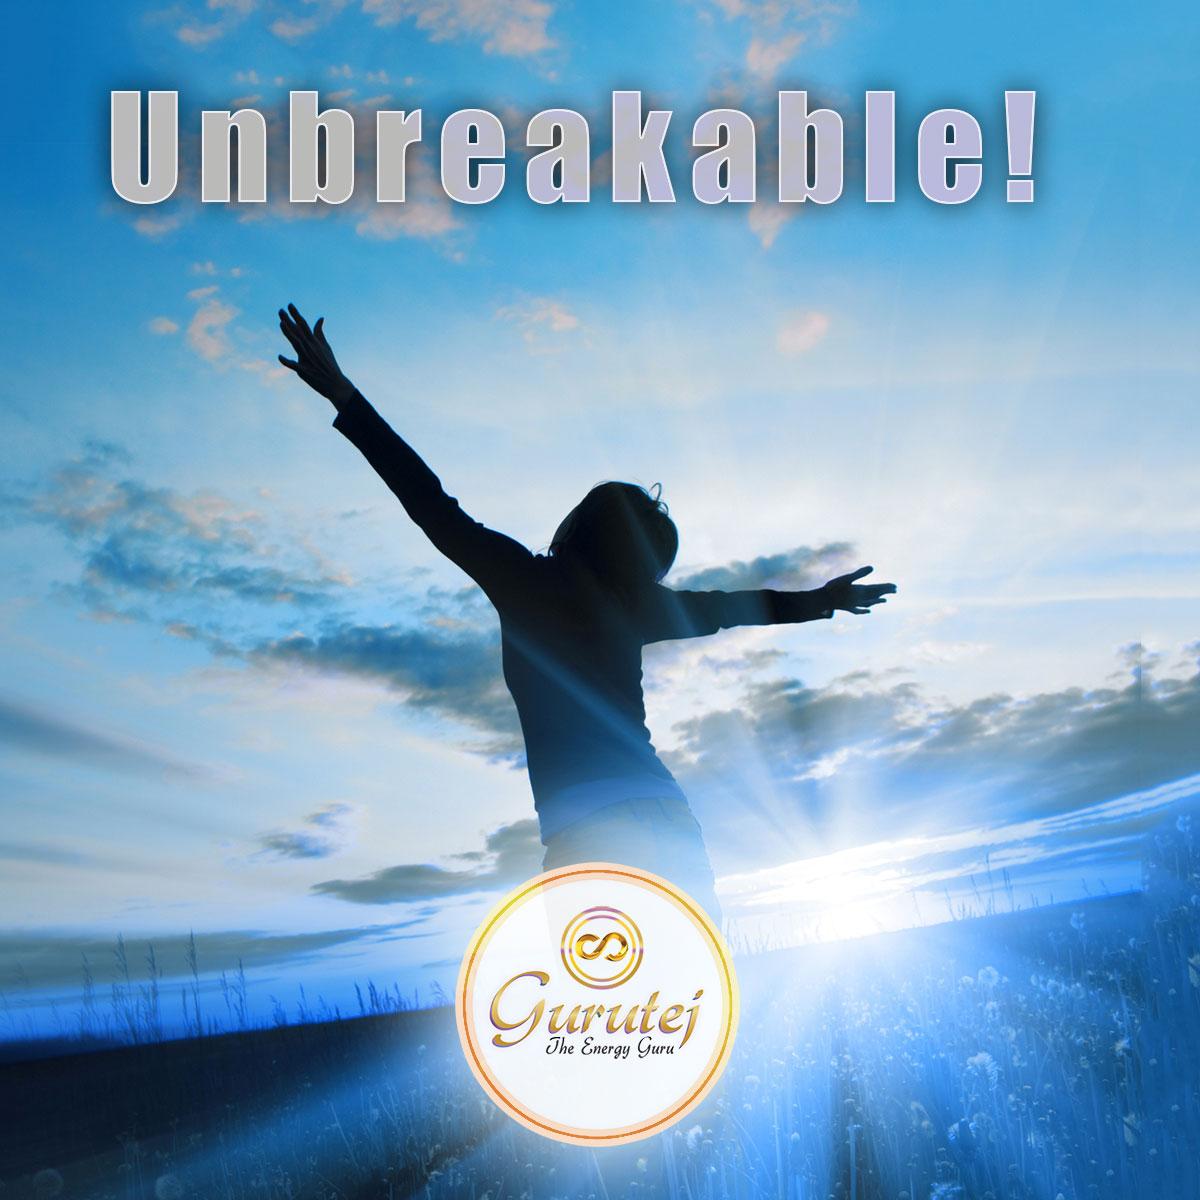 deep-gratitude-gurutej-unbreakable-1200x1200